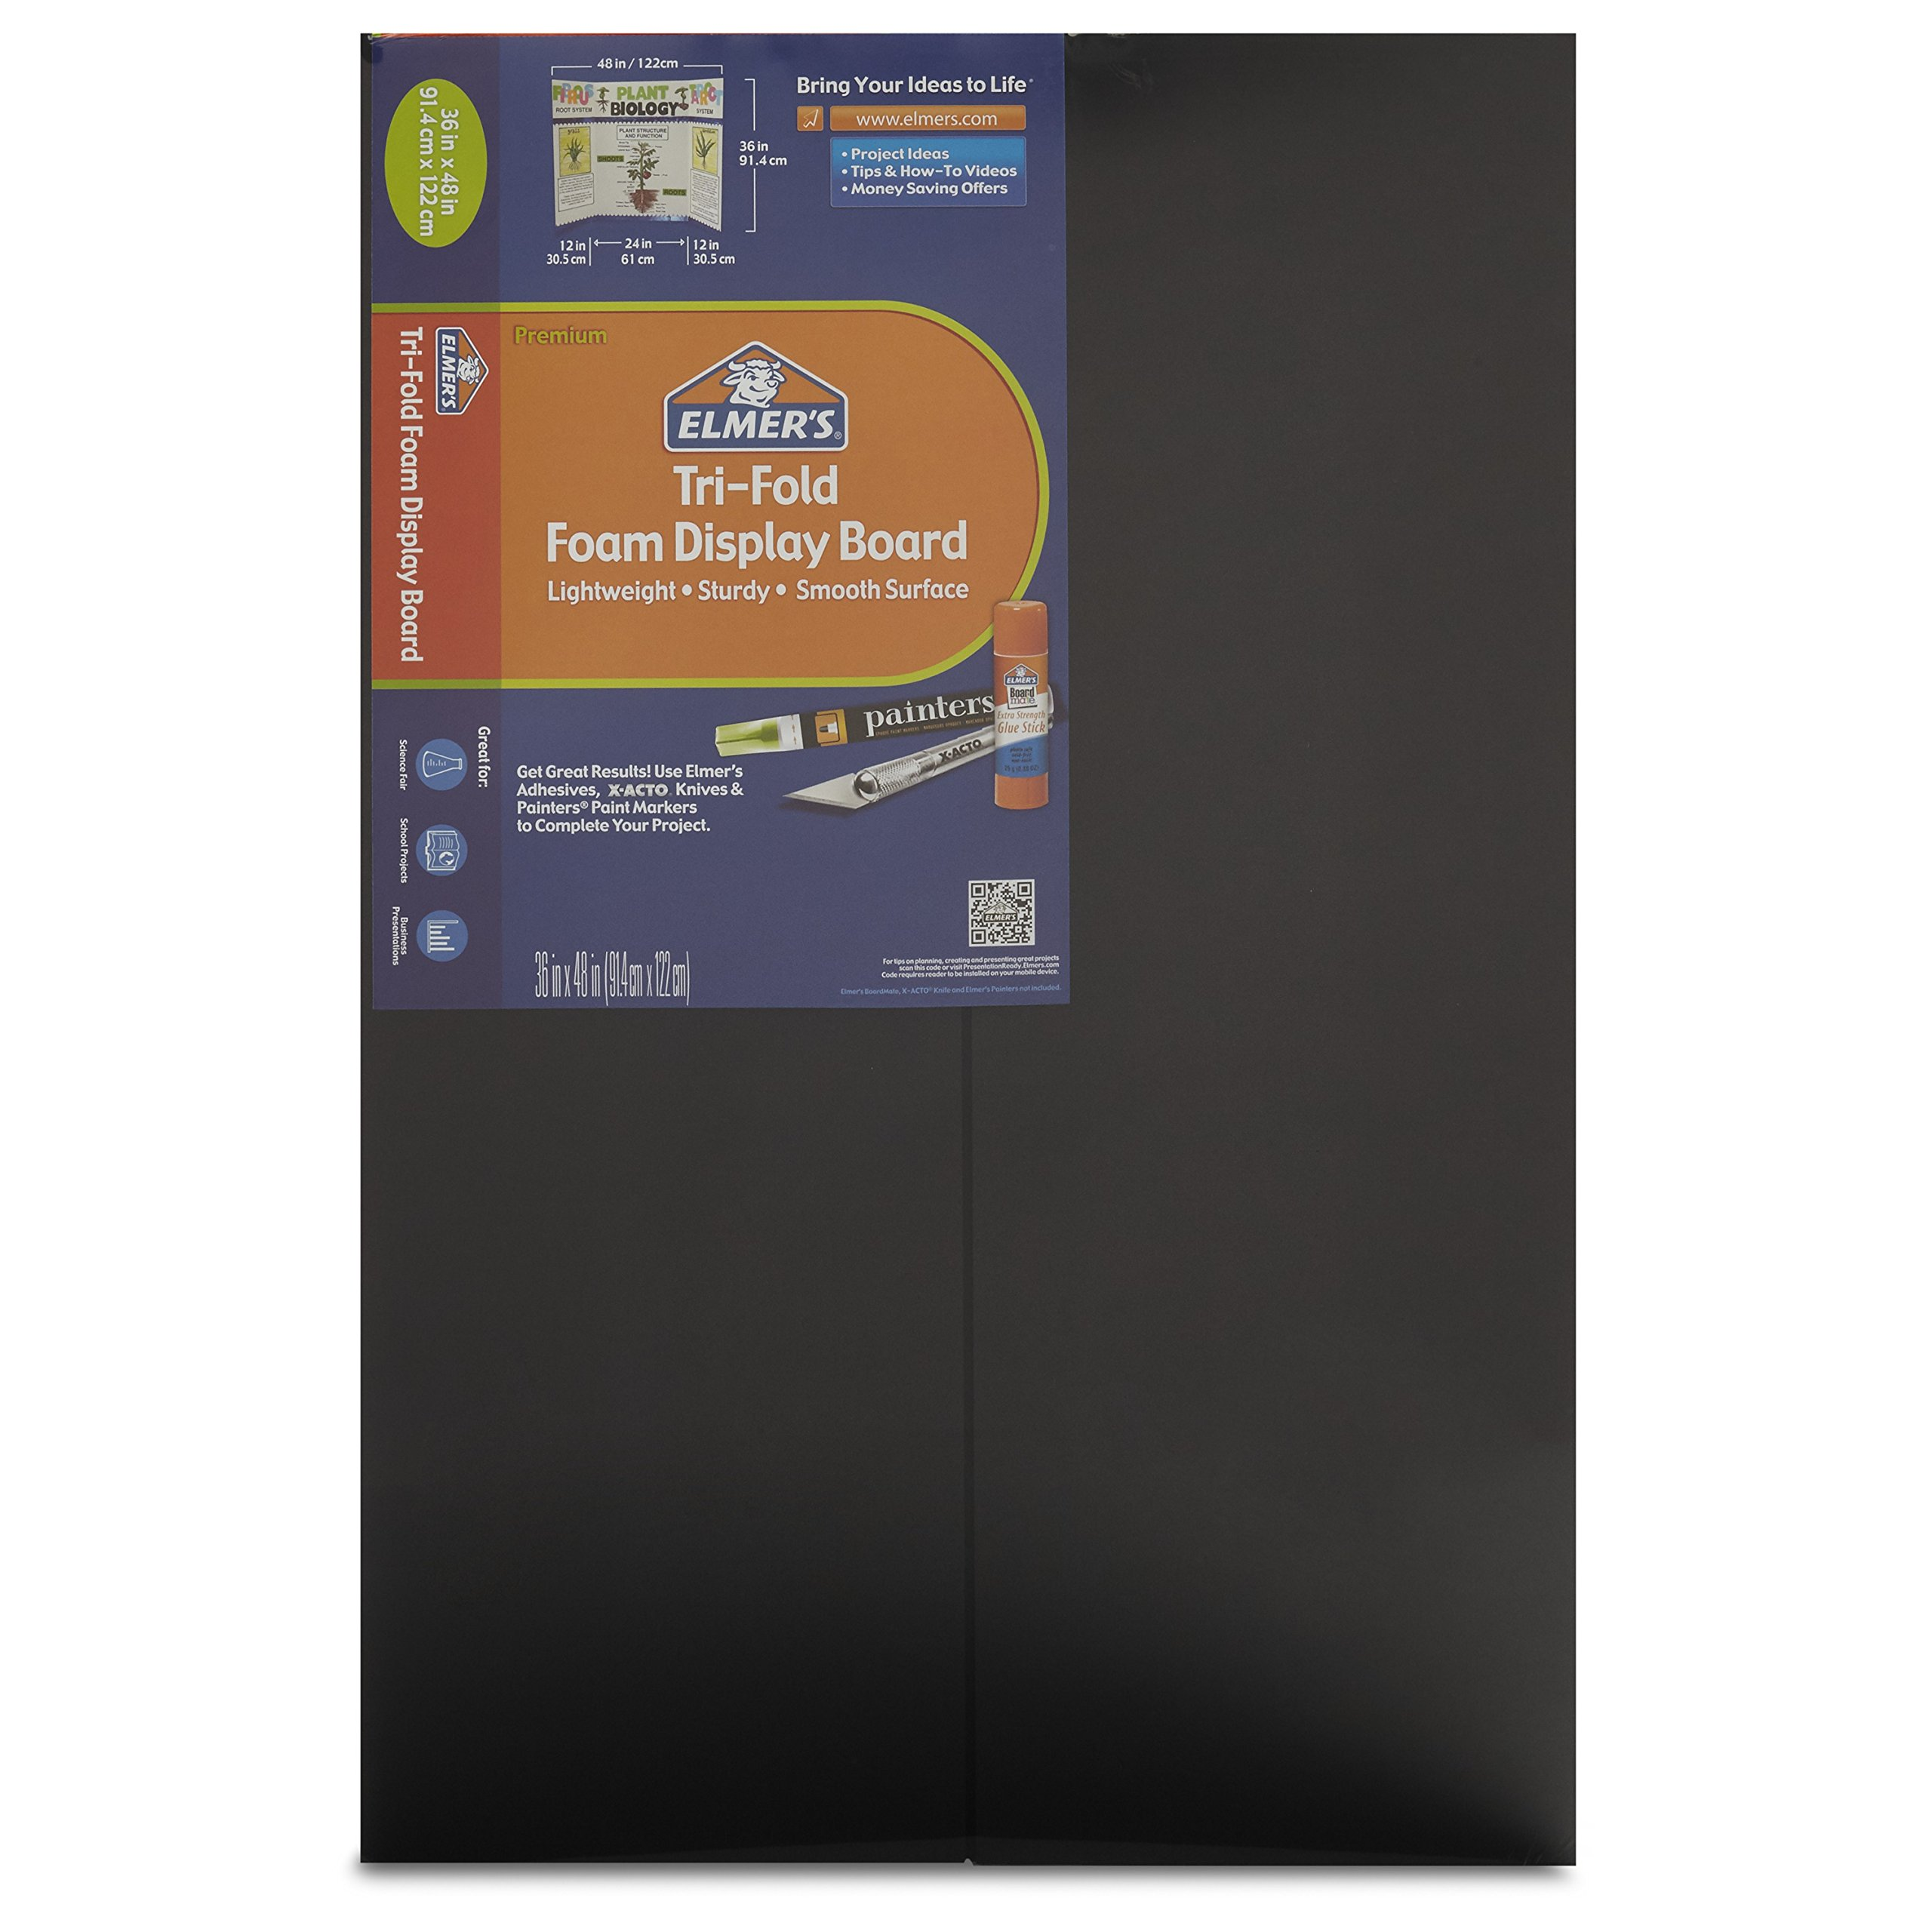 Elmer's Tri-Fold Premium Foam Display Board, Black, 36x48 Inch (Pack of 12)